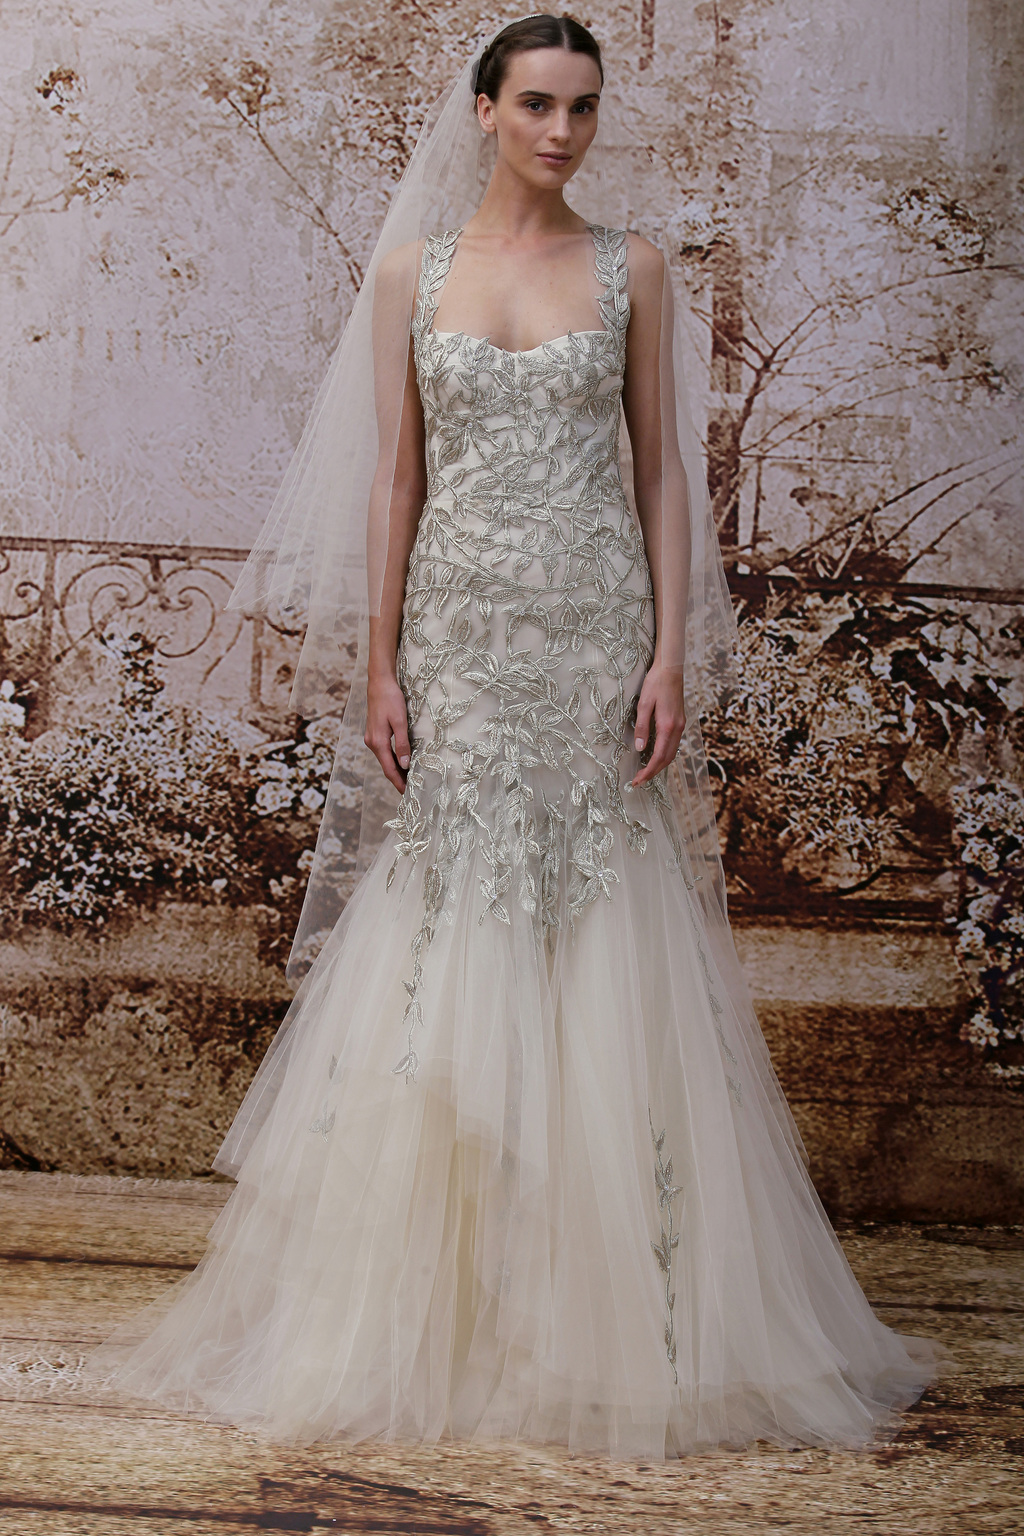 Garden-inspired-wedding-dress-by-monique-lhuillier.full